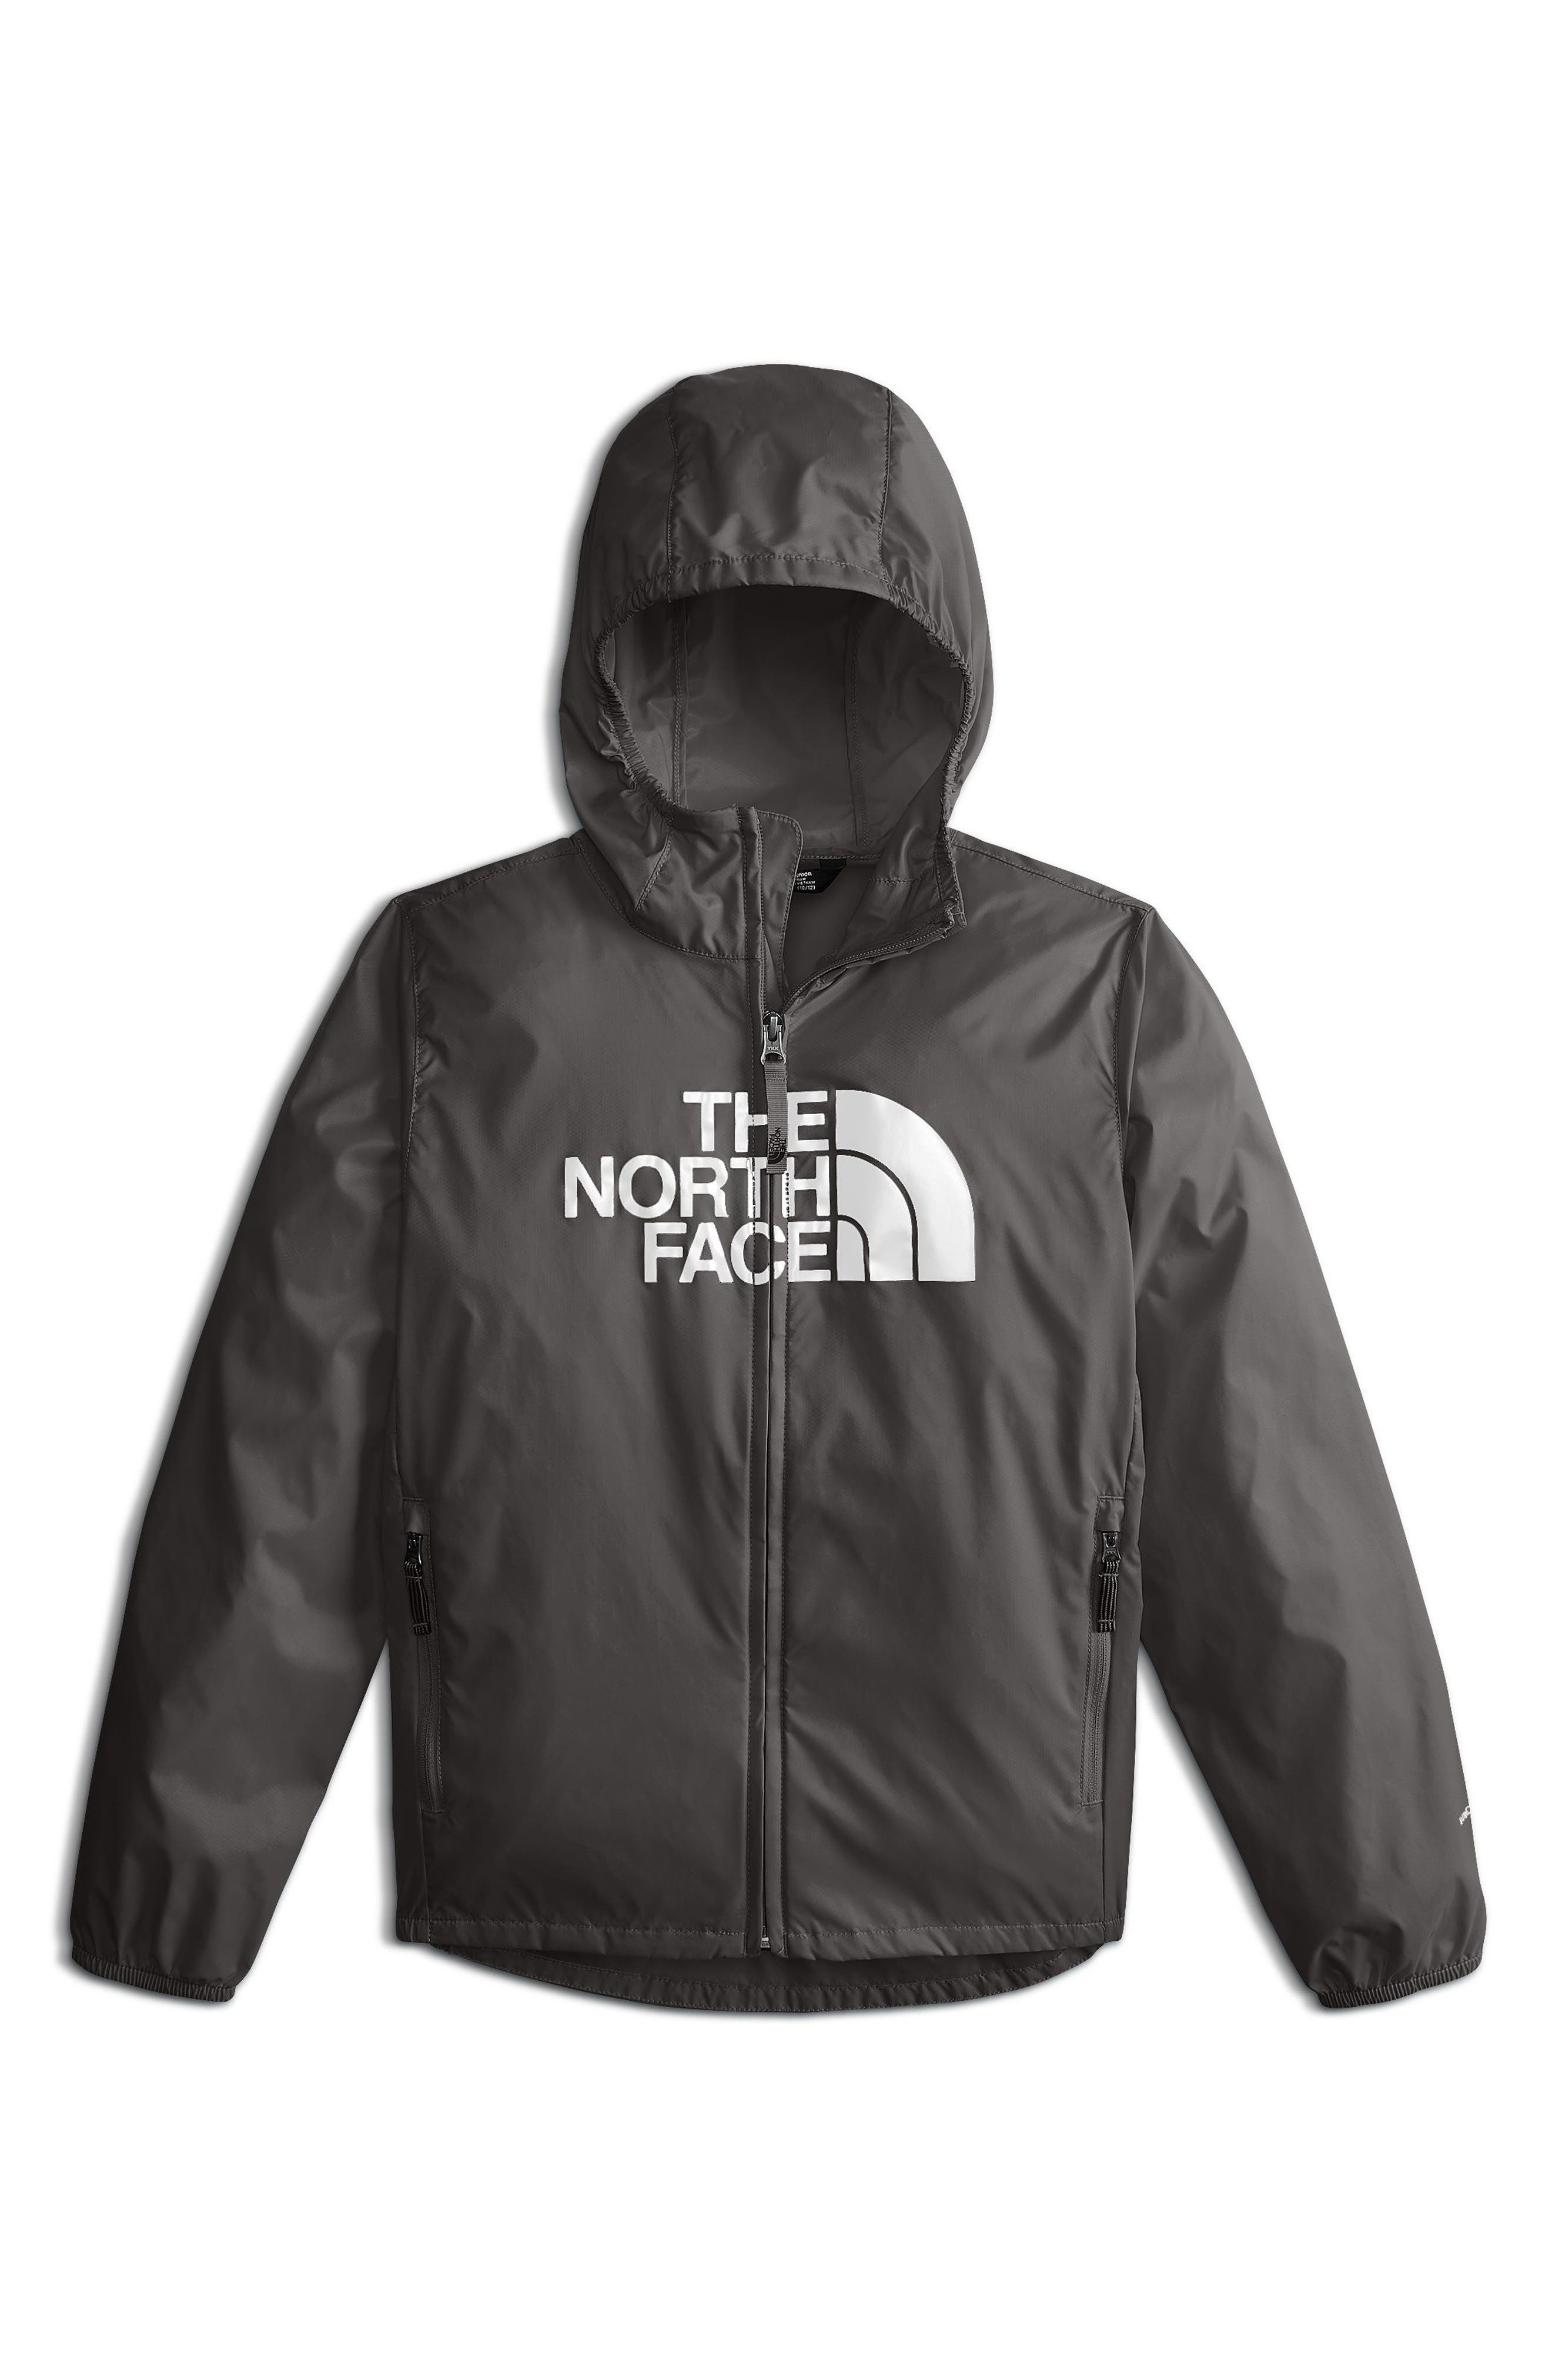 Alternate Image 1 Selected - The North Face Flurry Hooded Windbreaker Jacket (Big Boys)